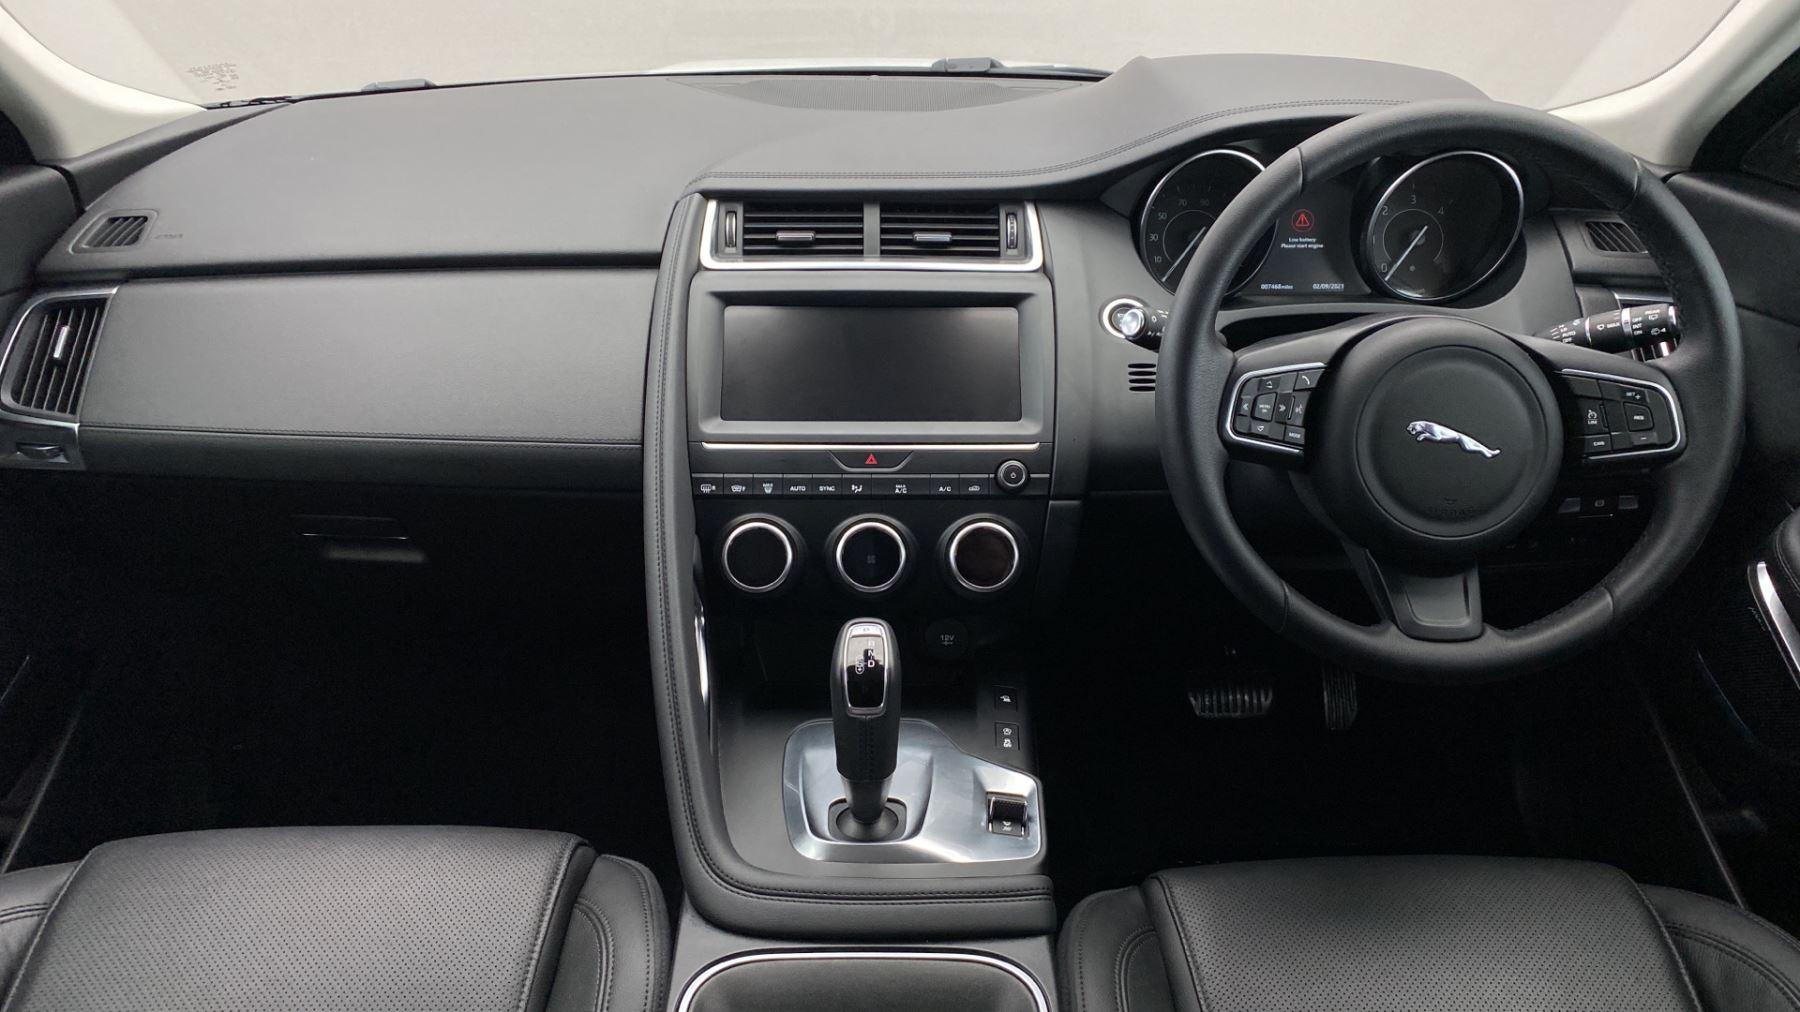 Jaguar E-PACE 2.0d SE AWD - Meridian Sound System - Powered Seats - Satellite Navigation image 11